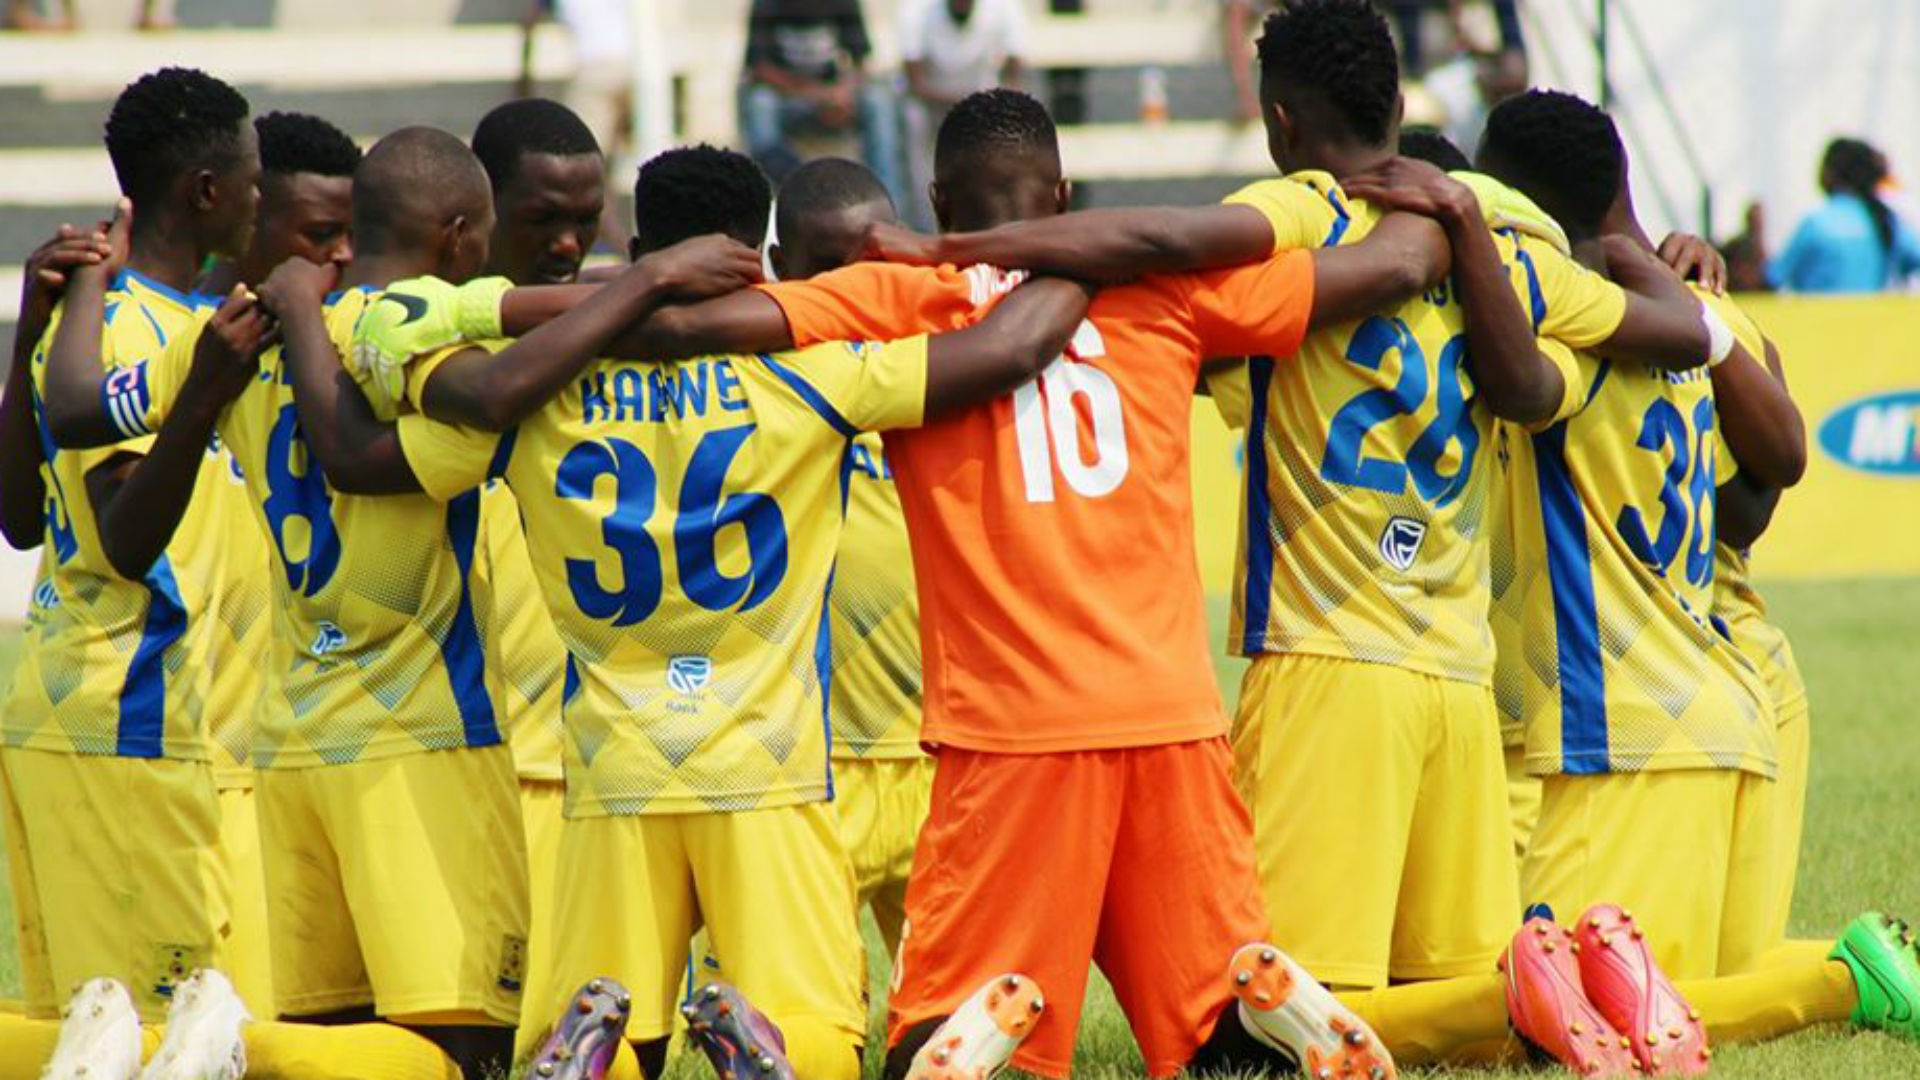 Caf Confederation Cup: Mayuka, Mwape missing as Napsa Stars travel for Gor Mahia showdown